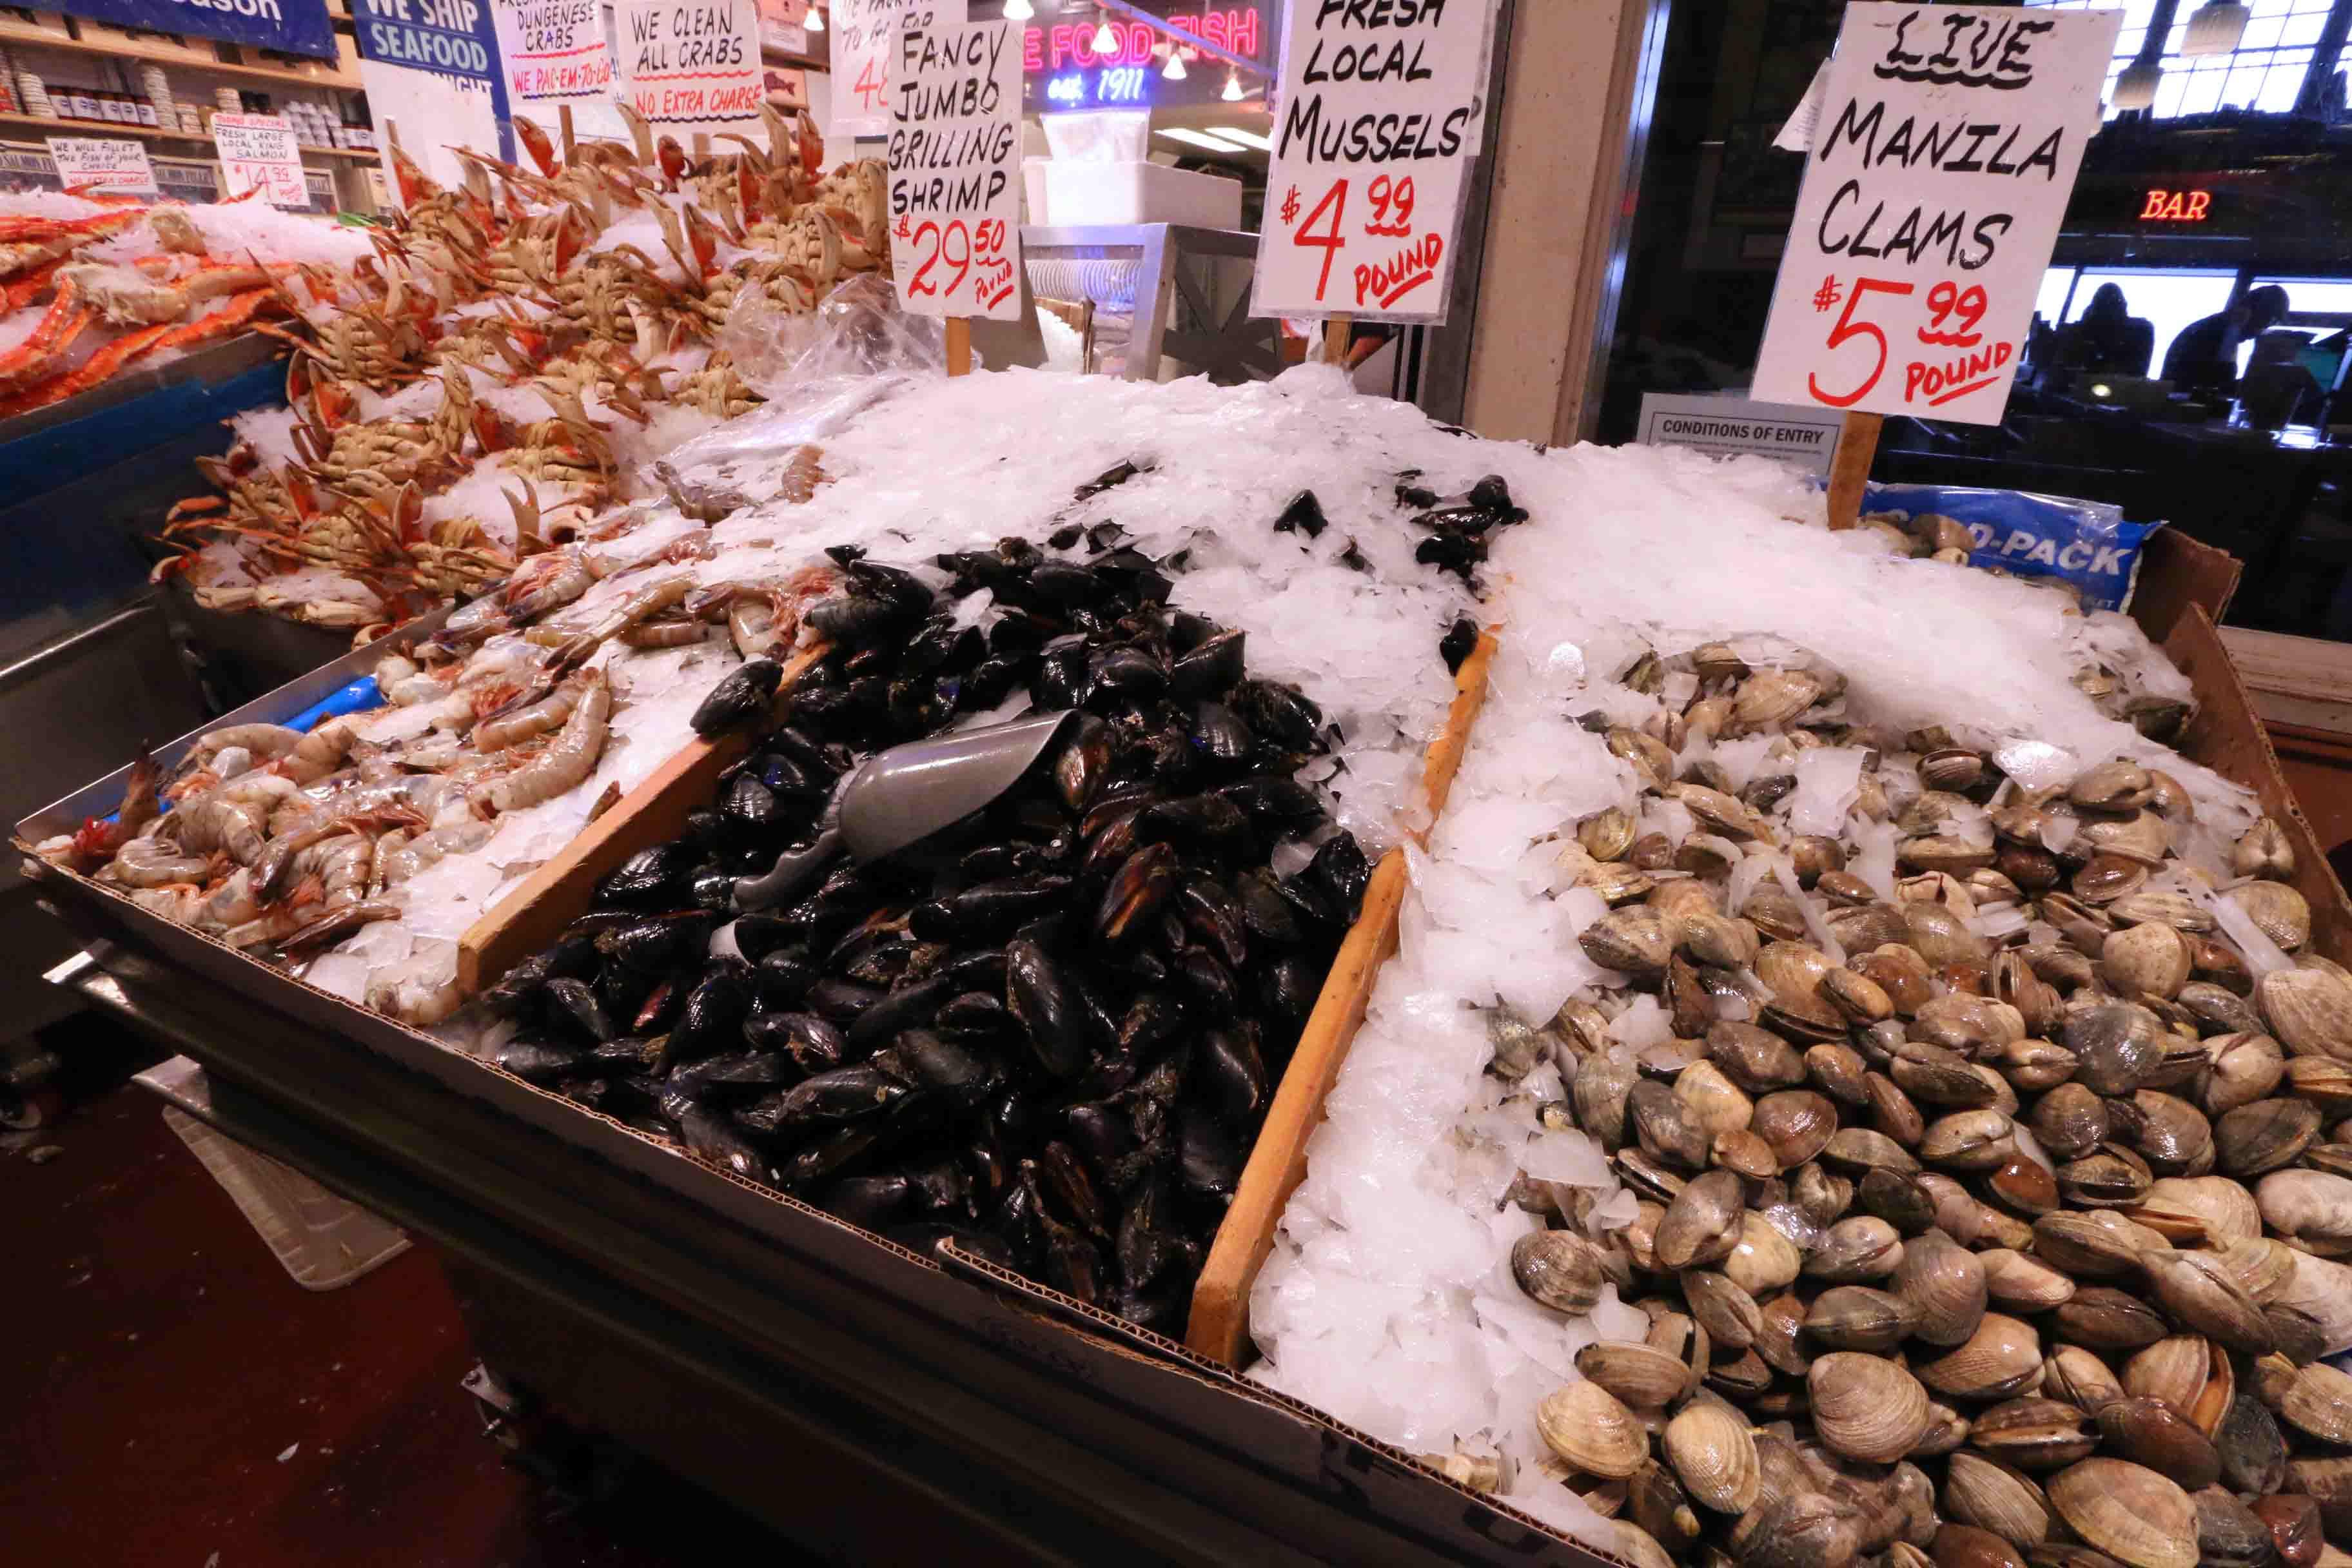 Market 25